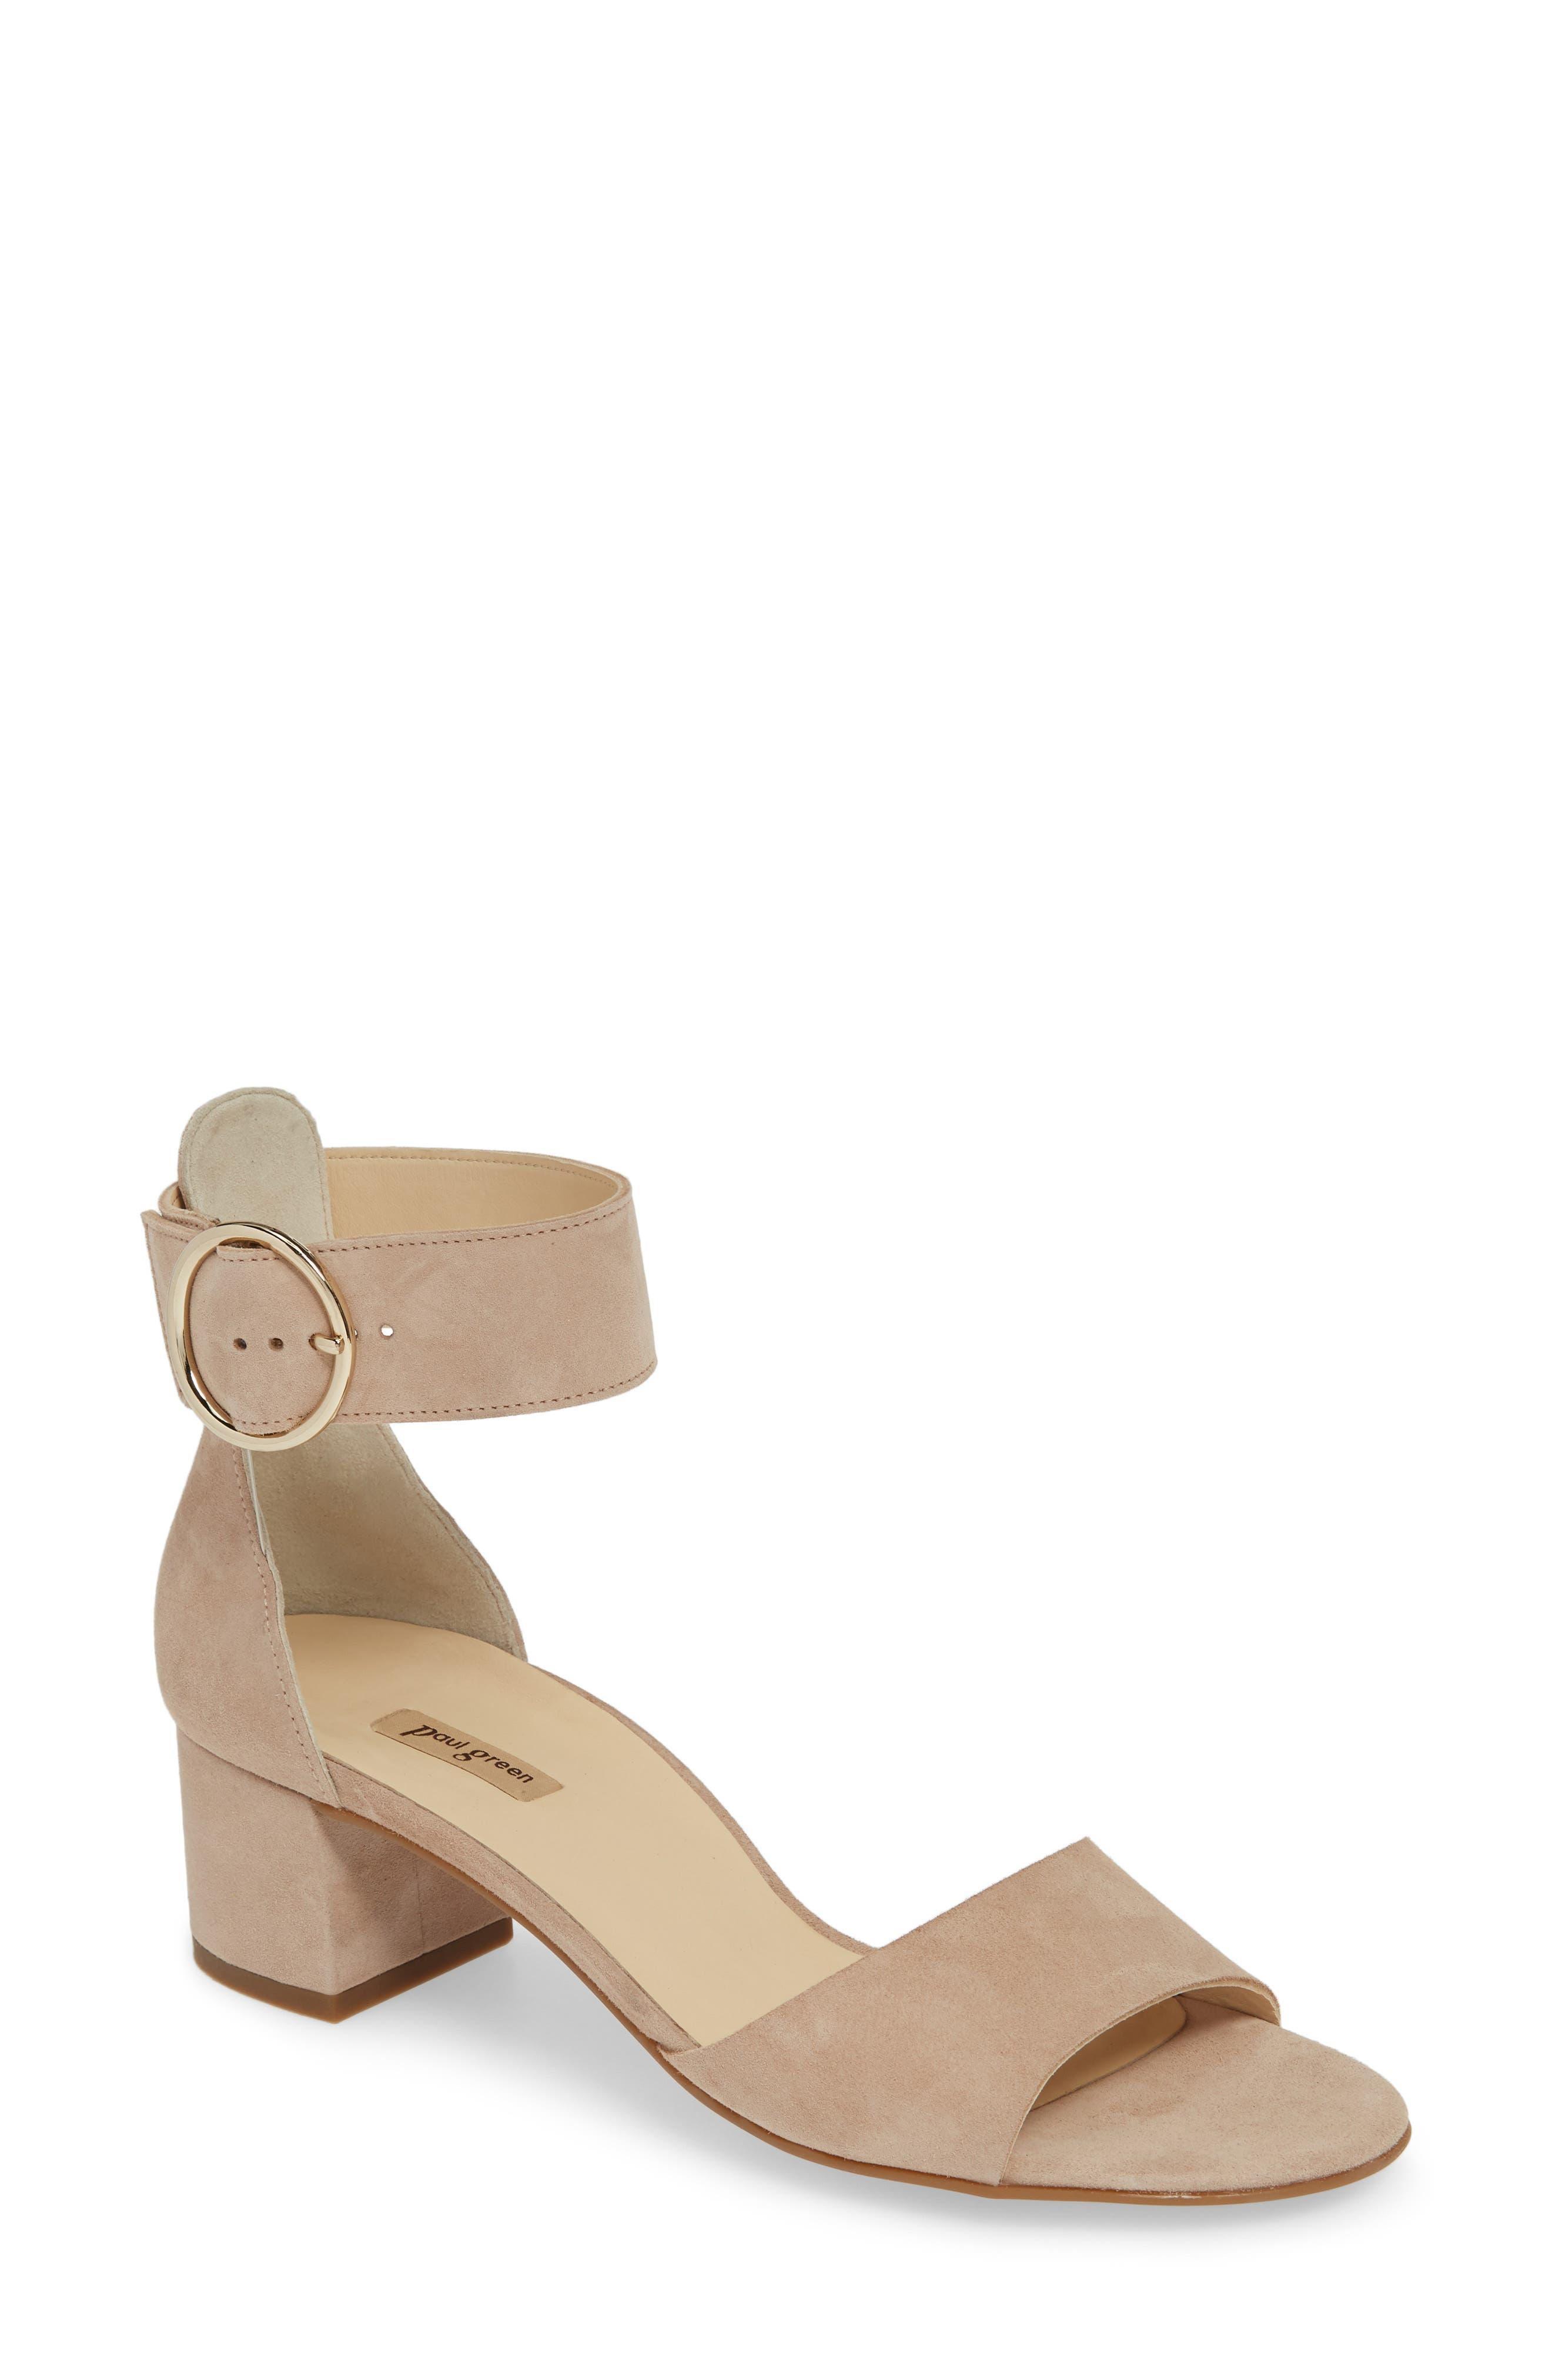 PAUL GREEN, Velma Ankle Strap Sandal, Main thumbnail 1, color, SAHARA SUEDE